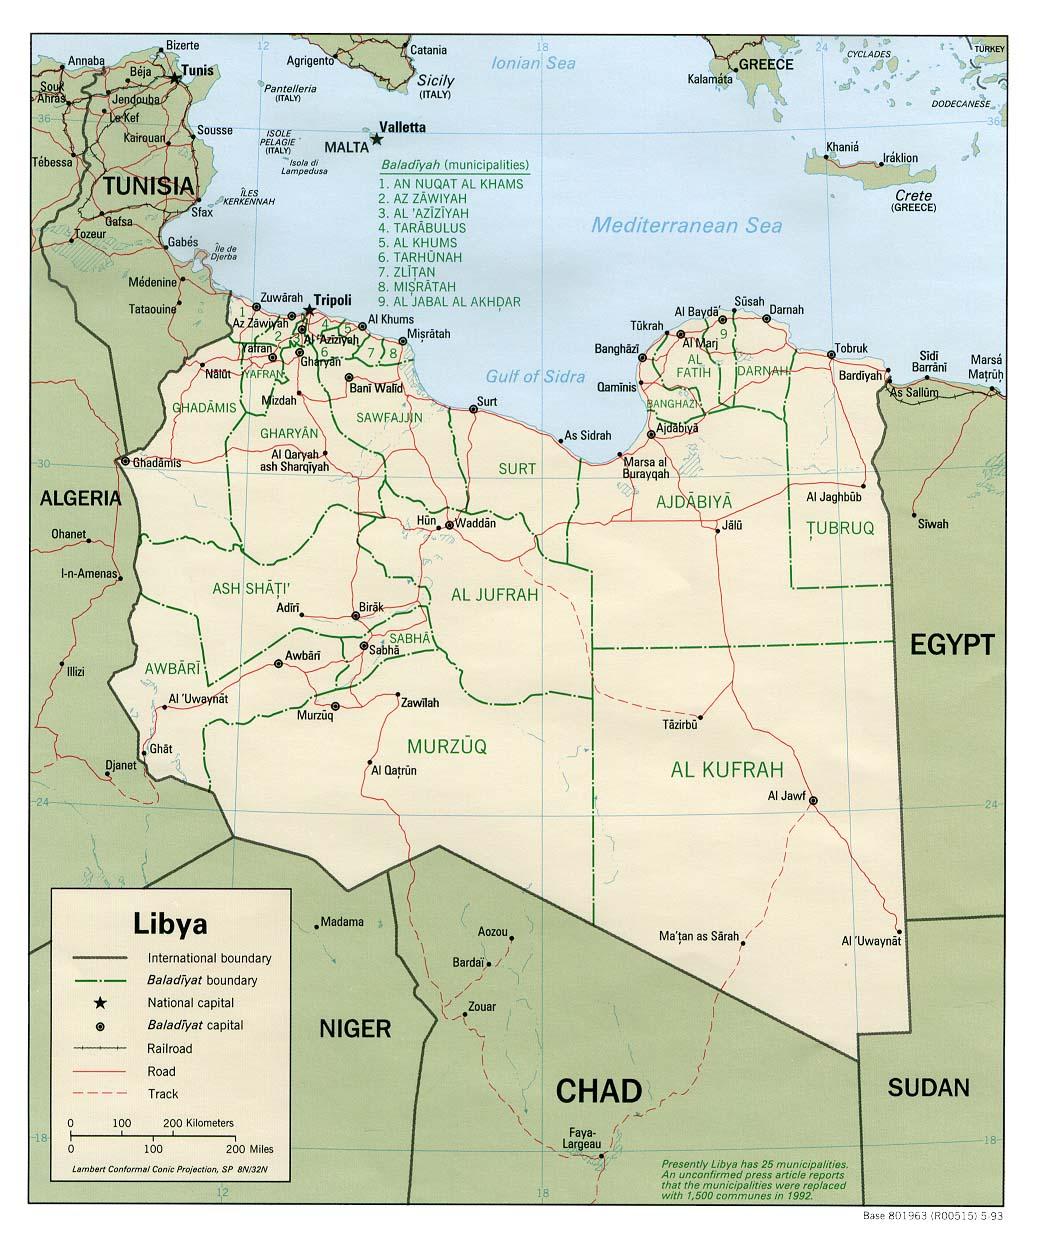 https://i1.wp.com/www.lib.utexas.edu/maps/africa/libya_pol93.jpg